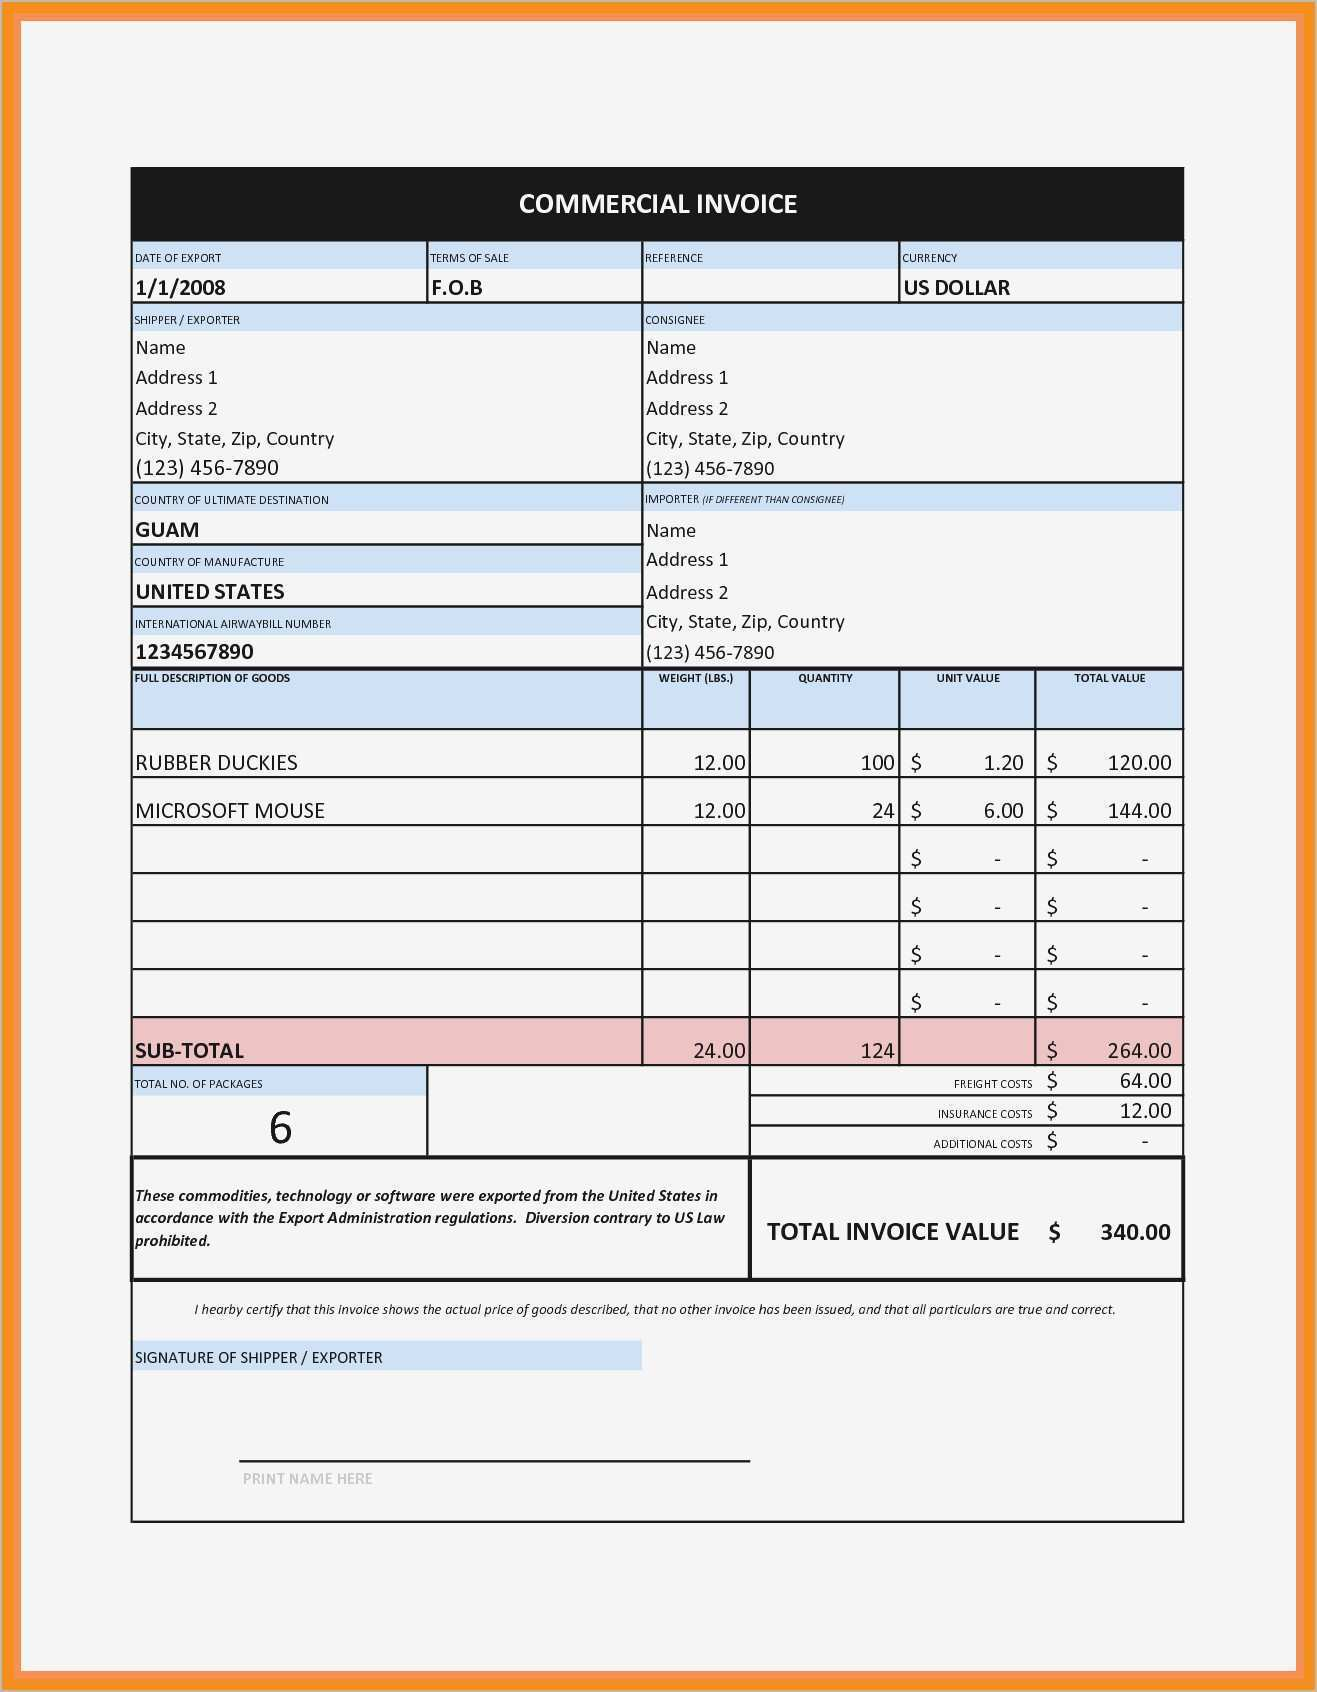 47 Printable Tax Invoice Template Excel Australia Now By Tax Invoice Template Excel Australia Cards Design Templates